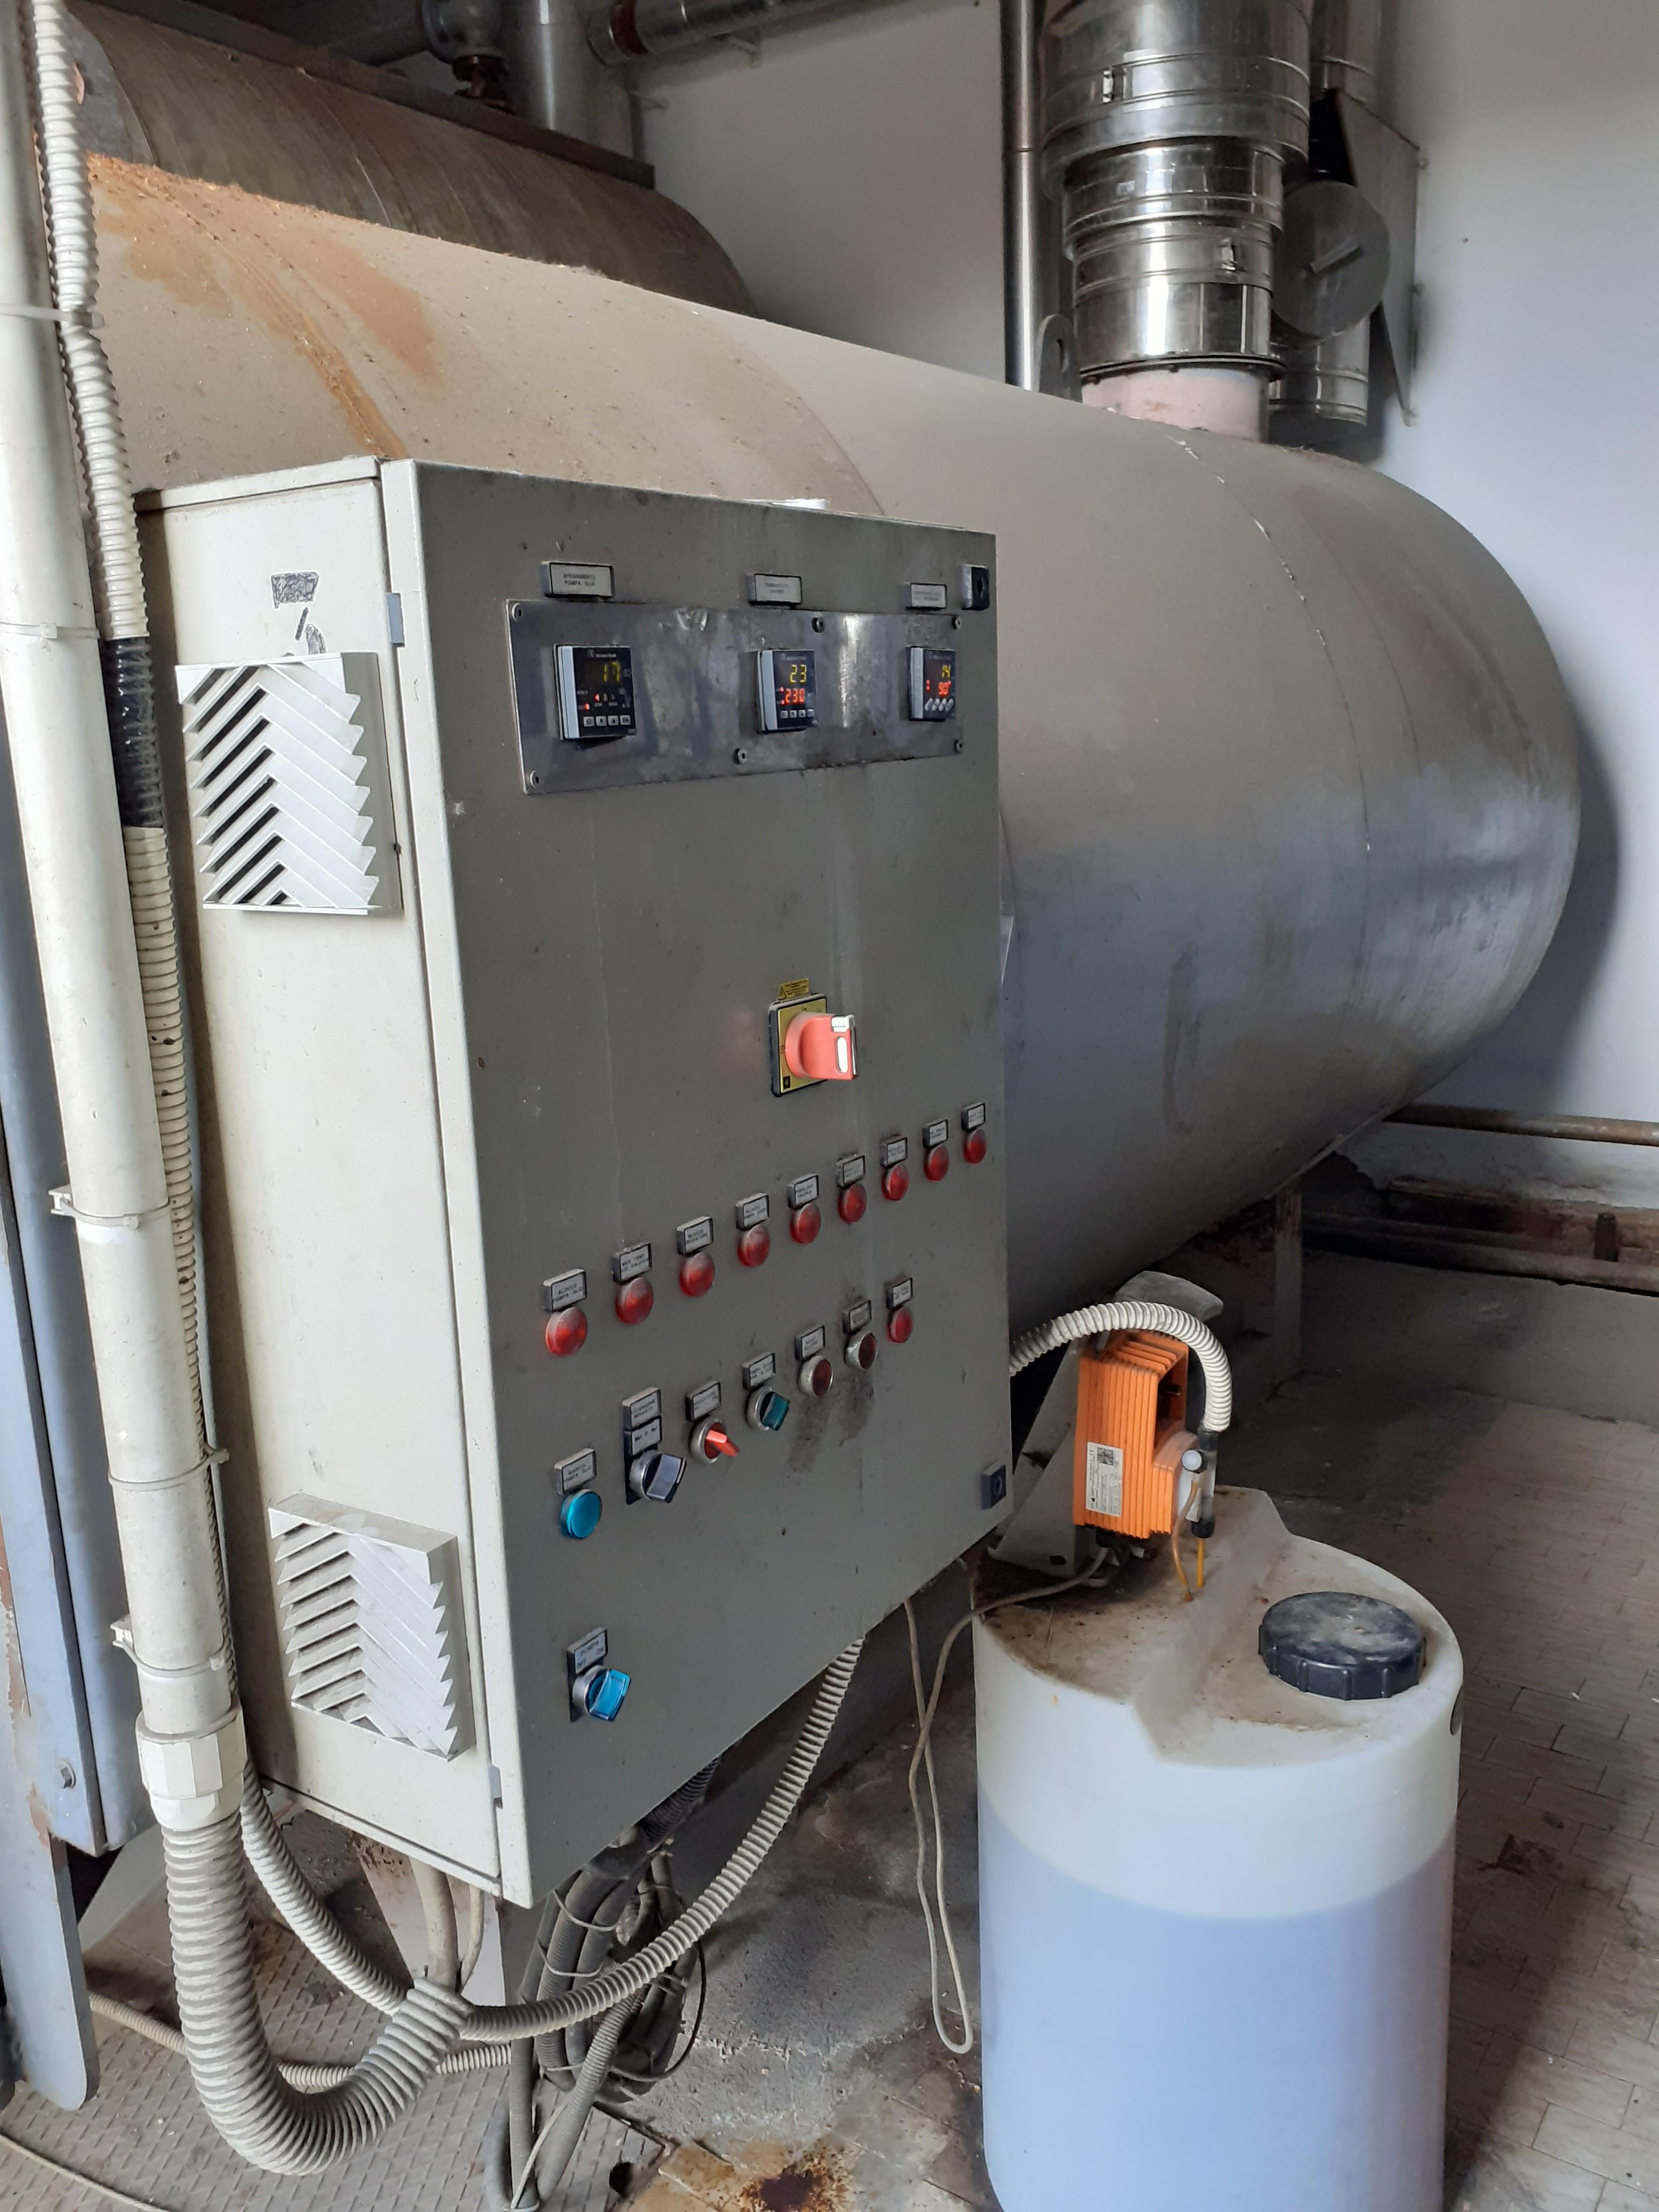 centrale termica in vendita - foto 1